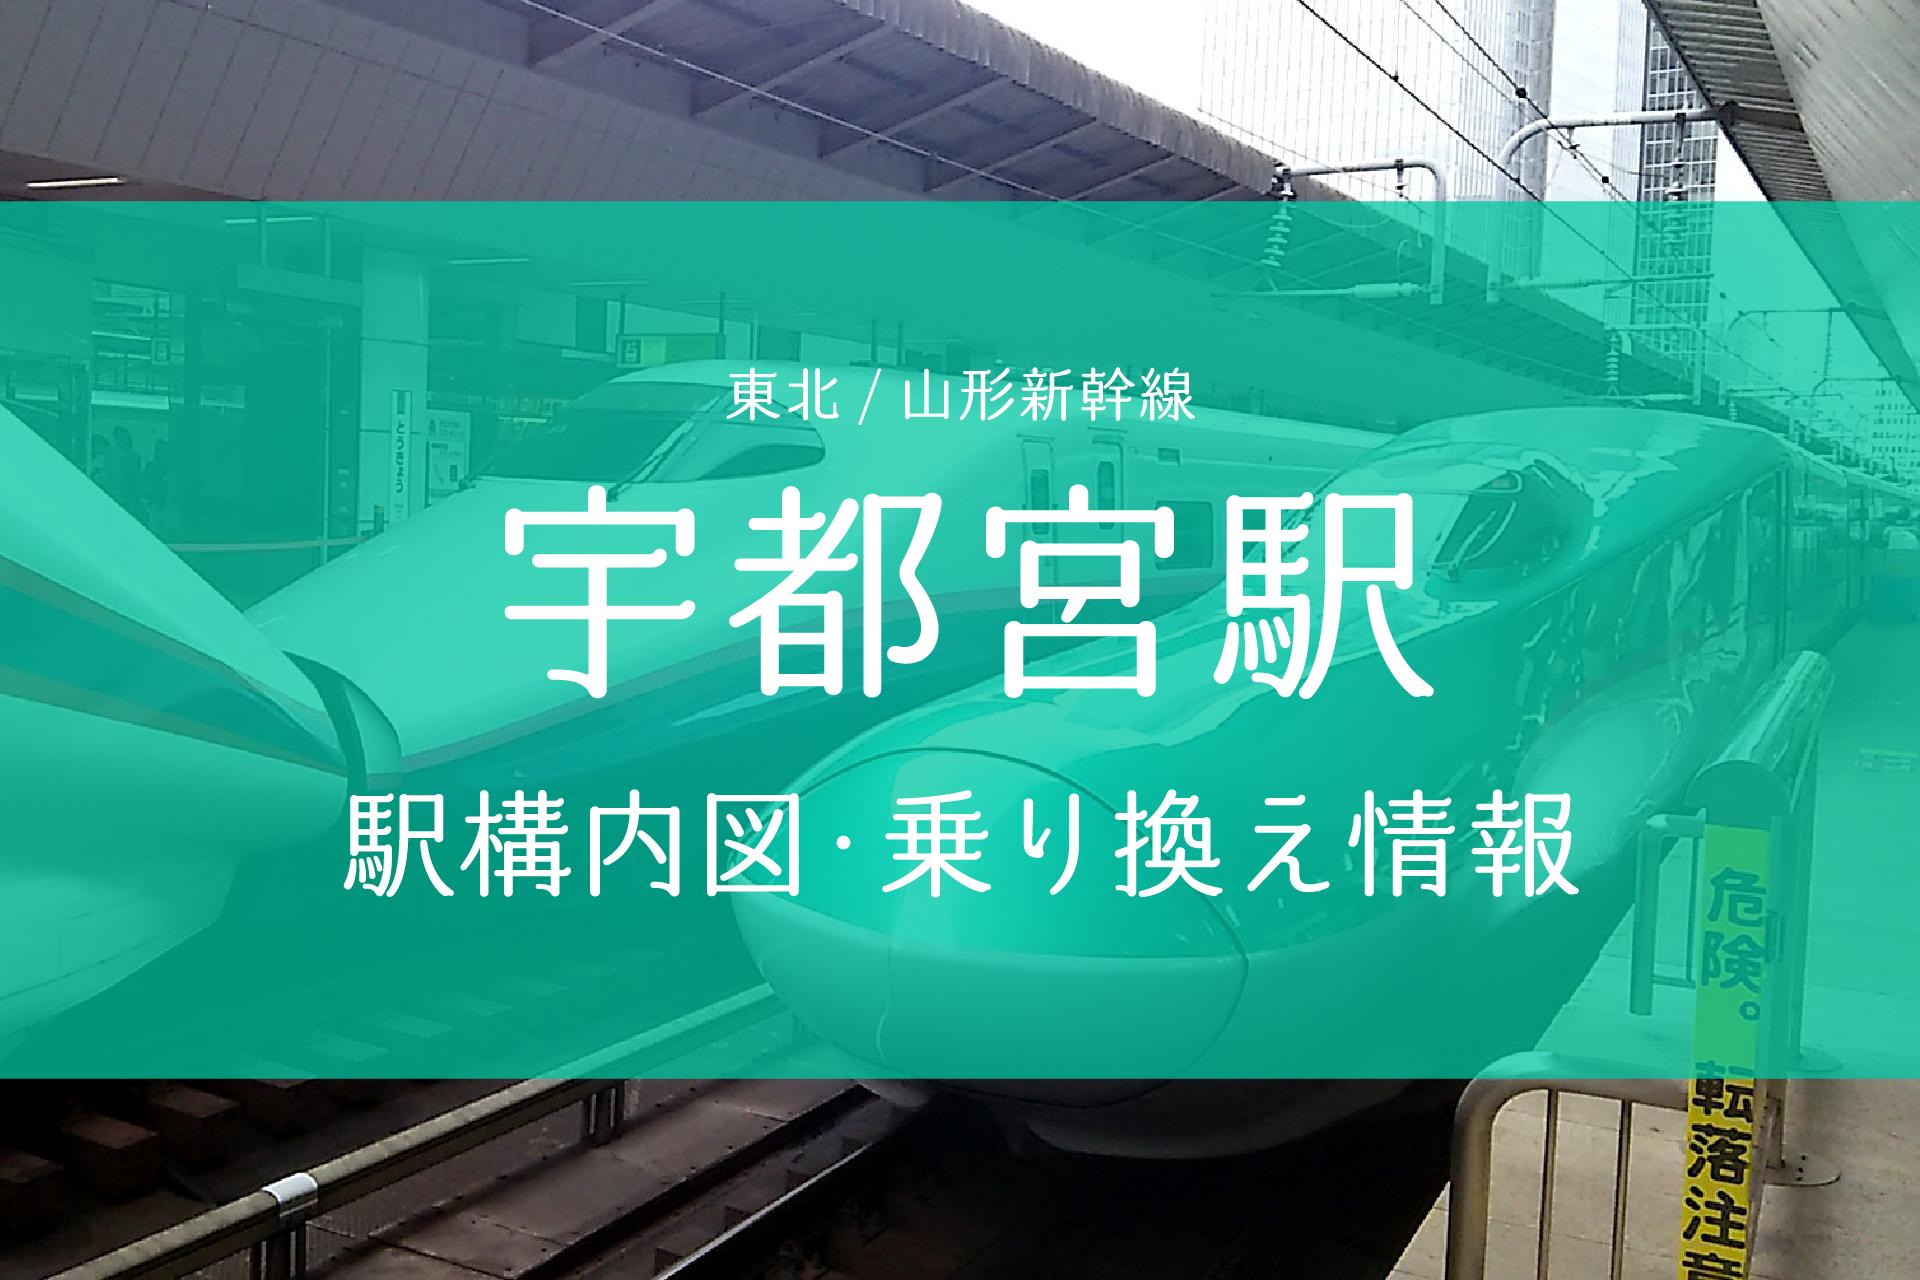 宇都宮駅構内図・乗り換え情報